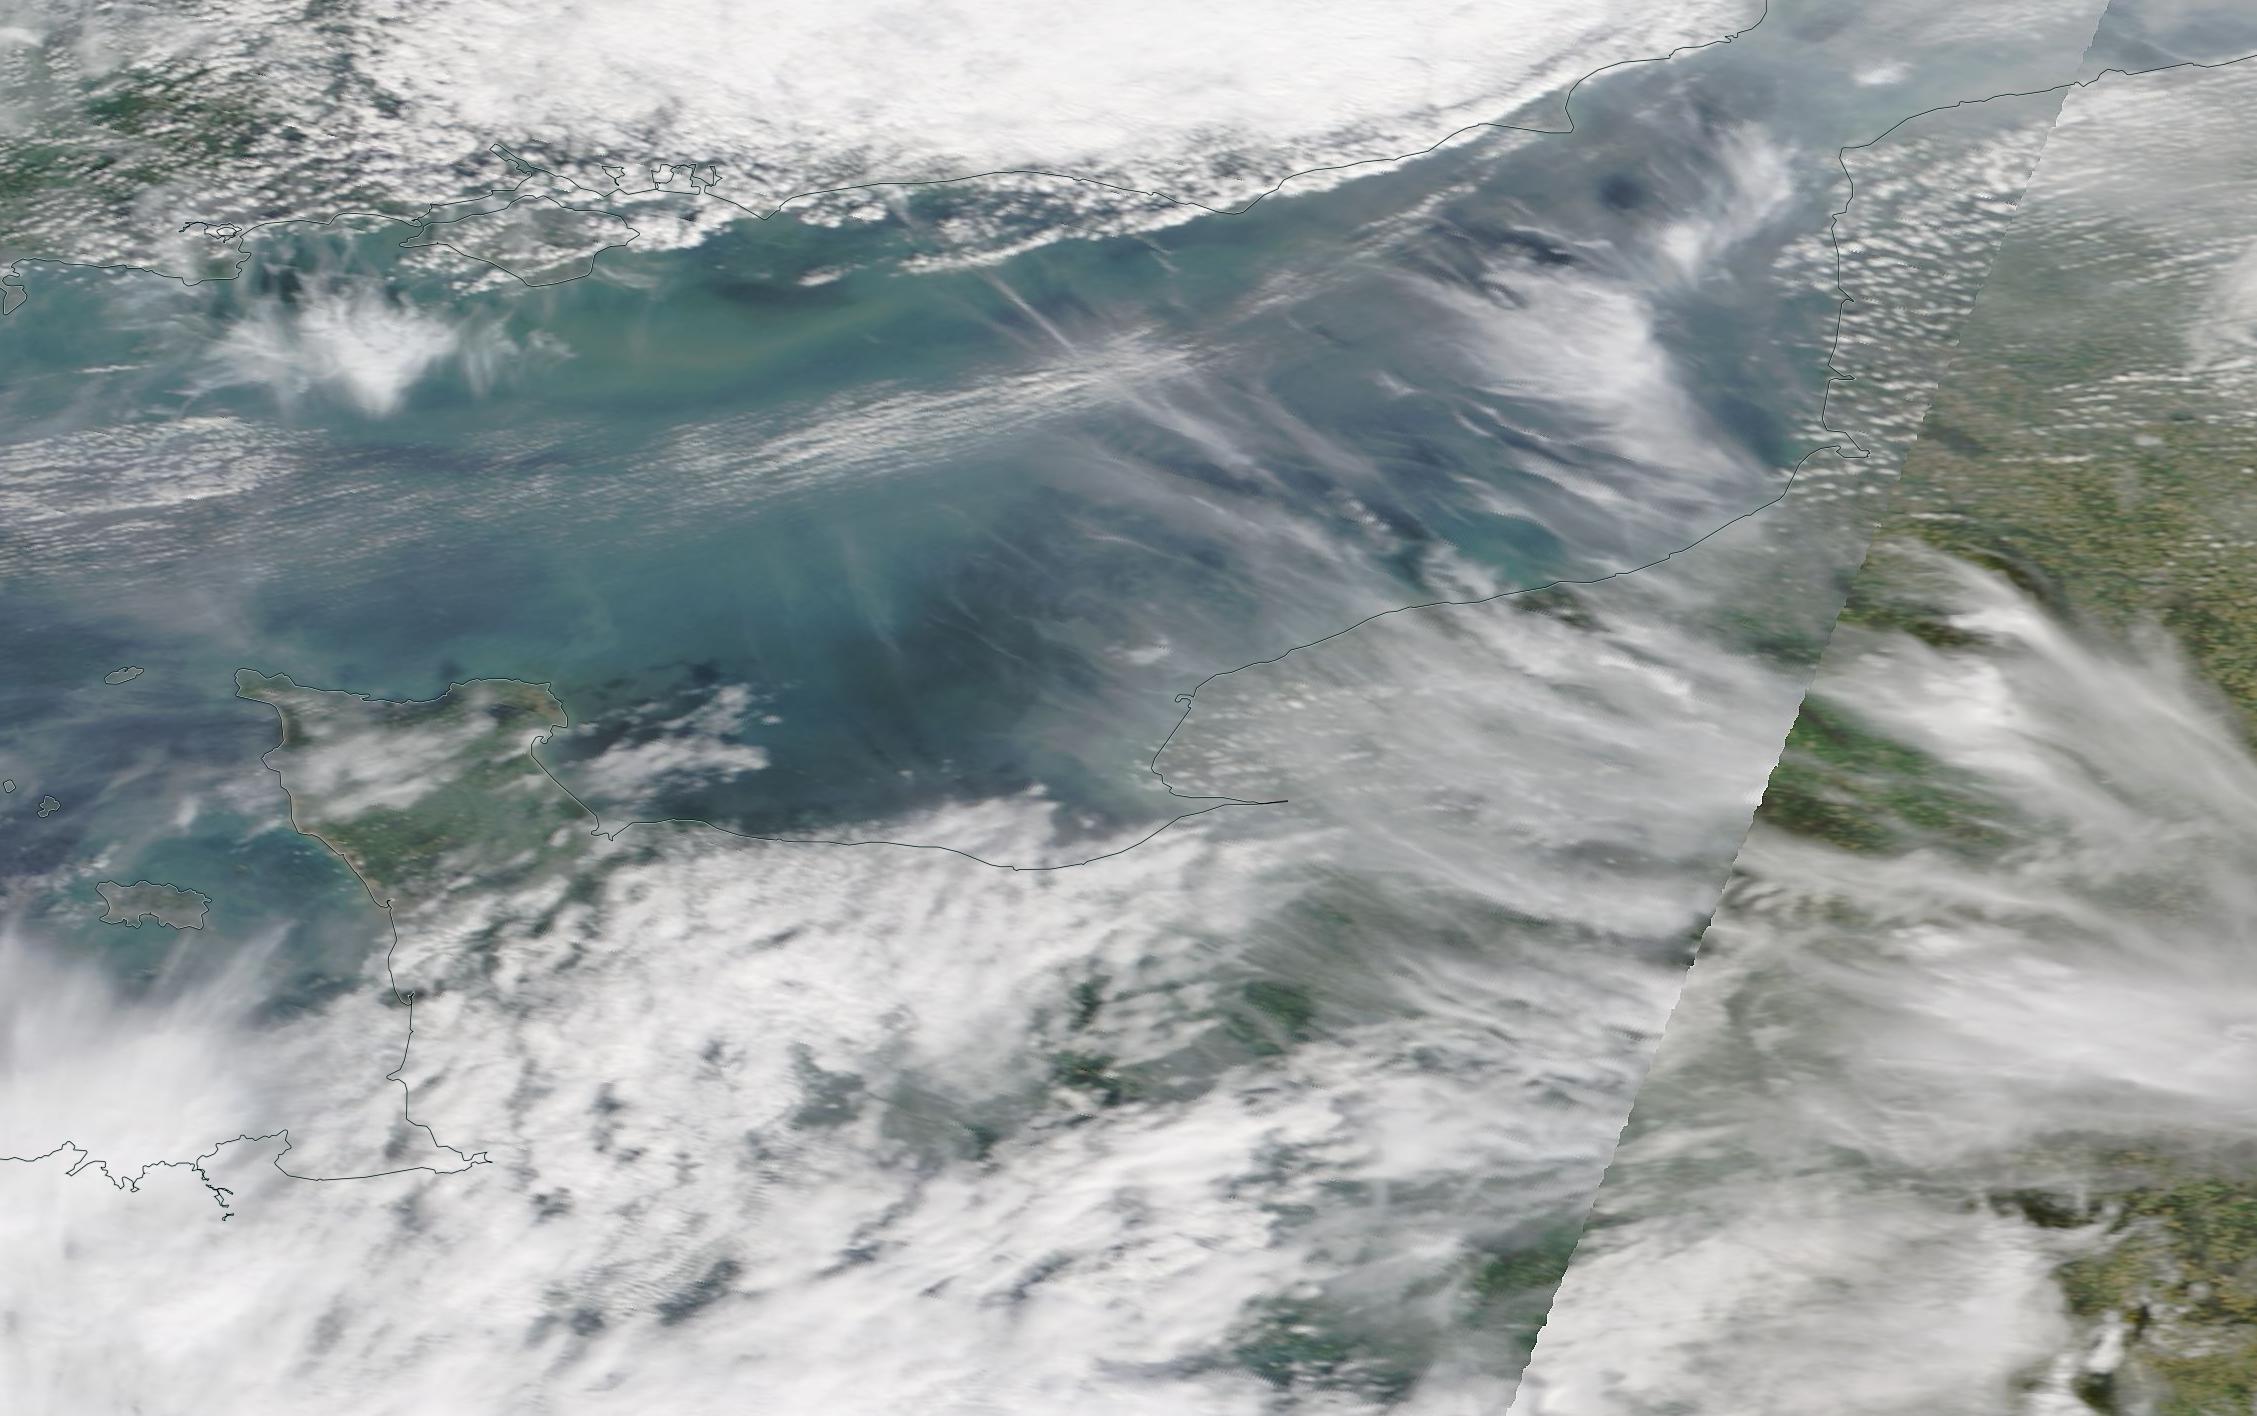 chemtrail geoengineering English Channel Brittany 6 April 2019 ... https://go.nasa.gov/2UAhXtn